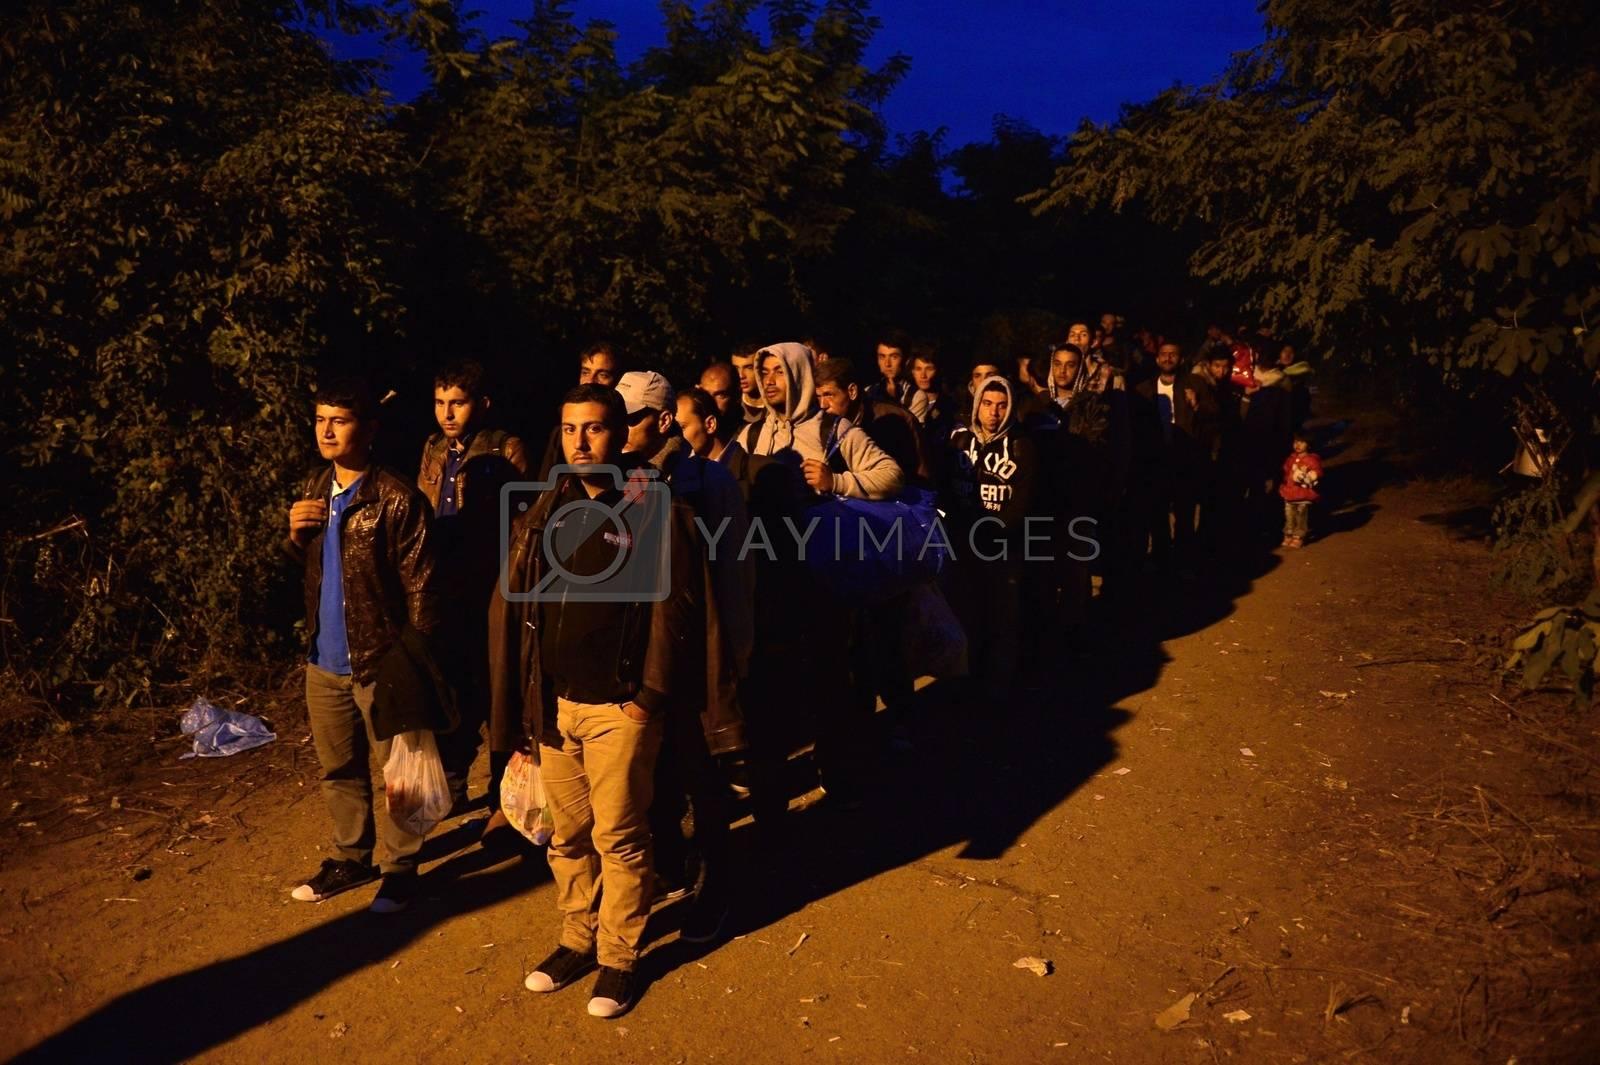 Royalty free image of refugees in Babska (Serbian - Croatina border) by radekprocyk